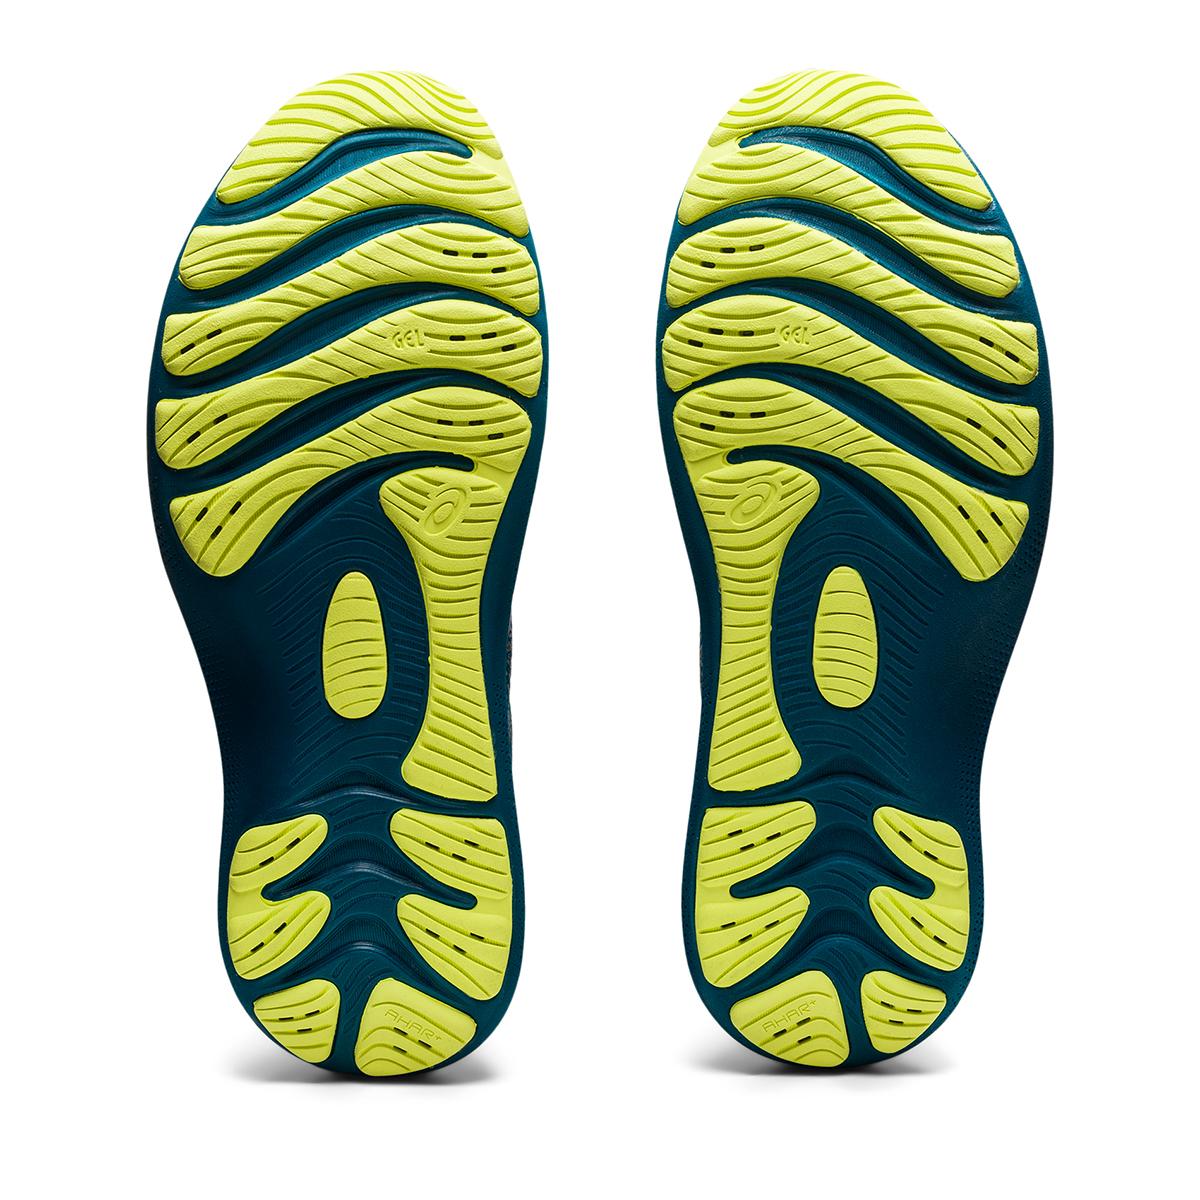 Men's Asics Gel-Nimbus Lite 2 Running Shoe - Color: Deep Sea Teal - Size: 7 - Width: Regular, Deep Sea Teal, large, image 6